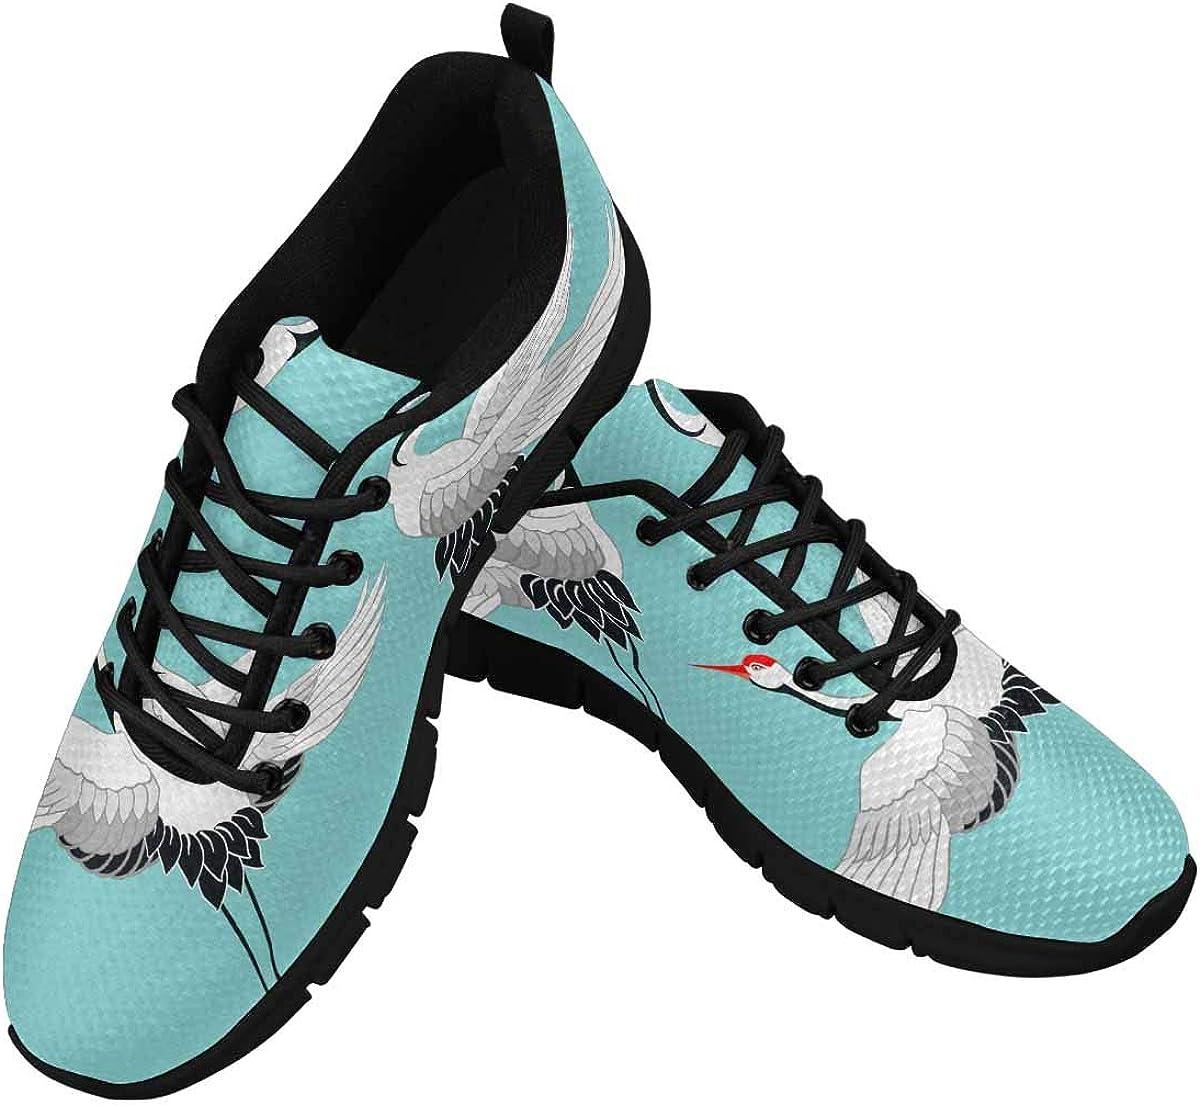 INTERESTPRINT Set of Crane Birds, Stork, Heron Women's Sneaker Lace Up Running Comfort Sports Shoes